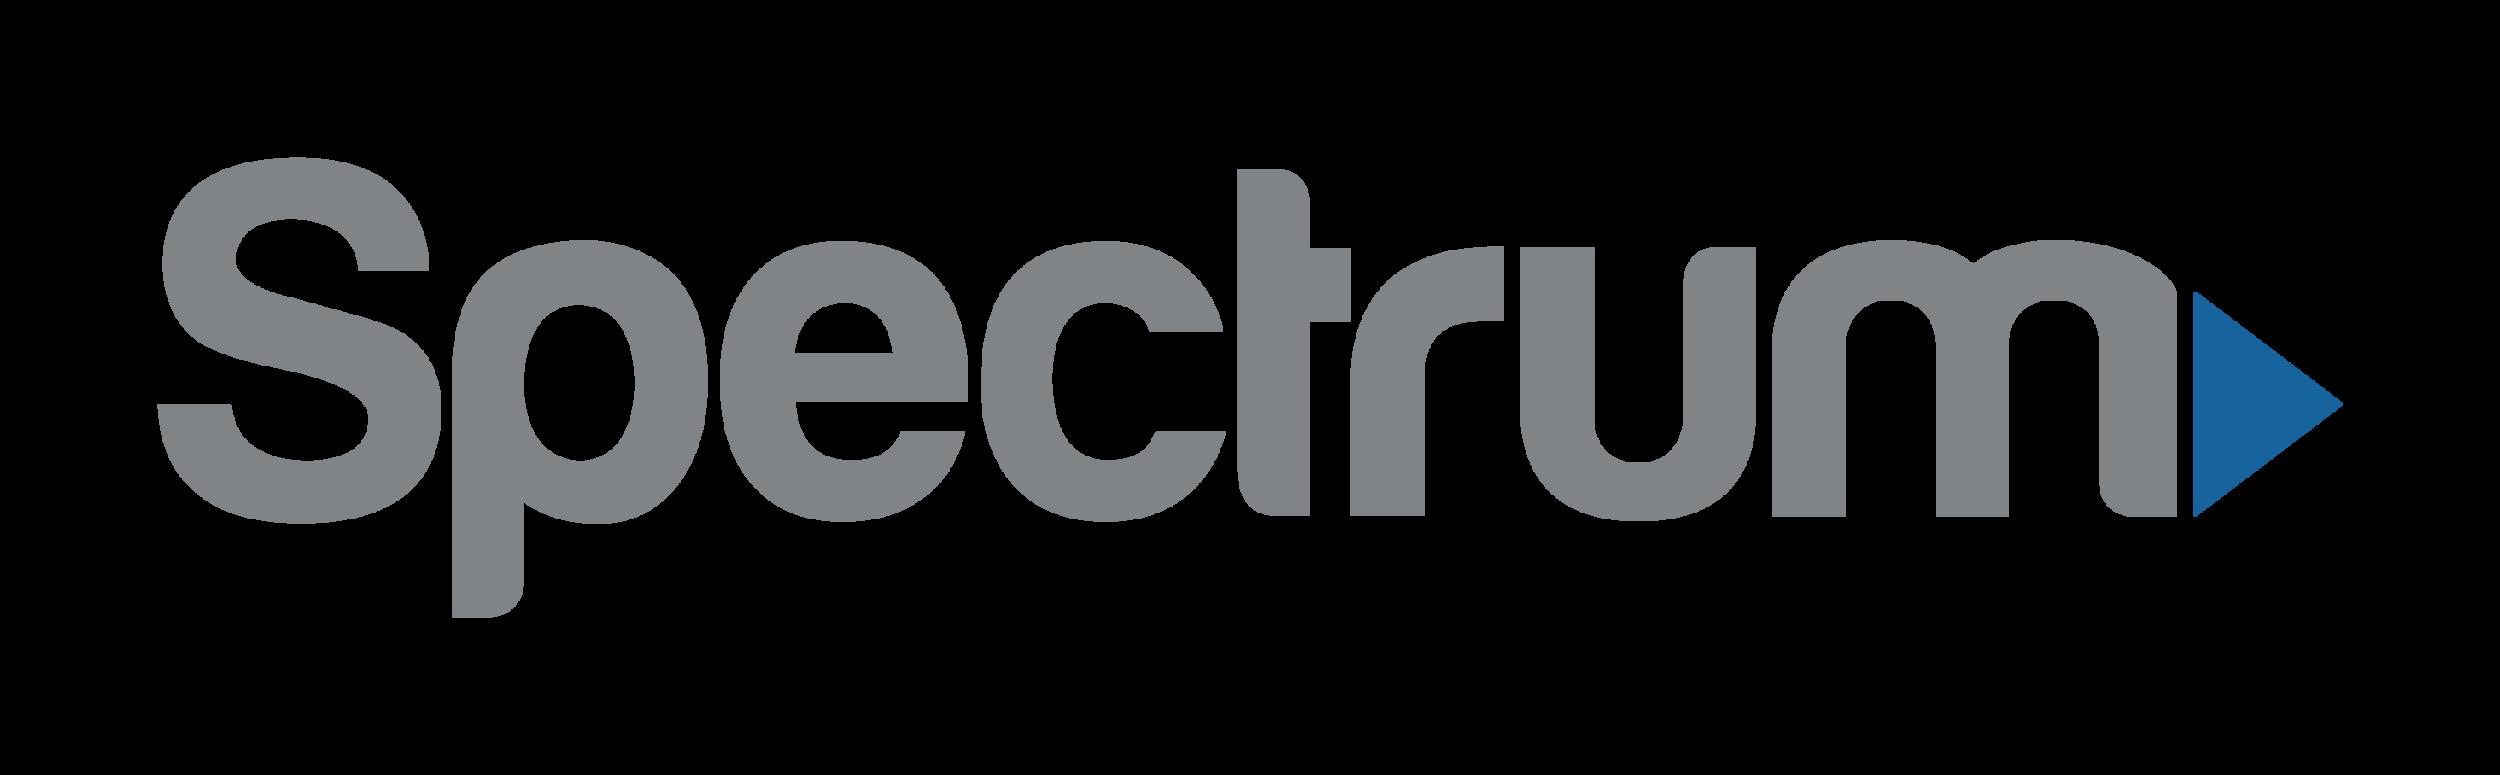 Spectrum - Logo 2018.png